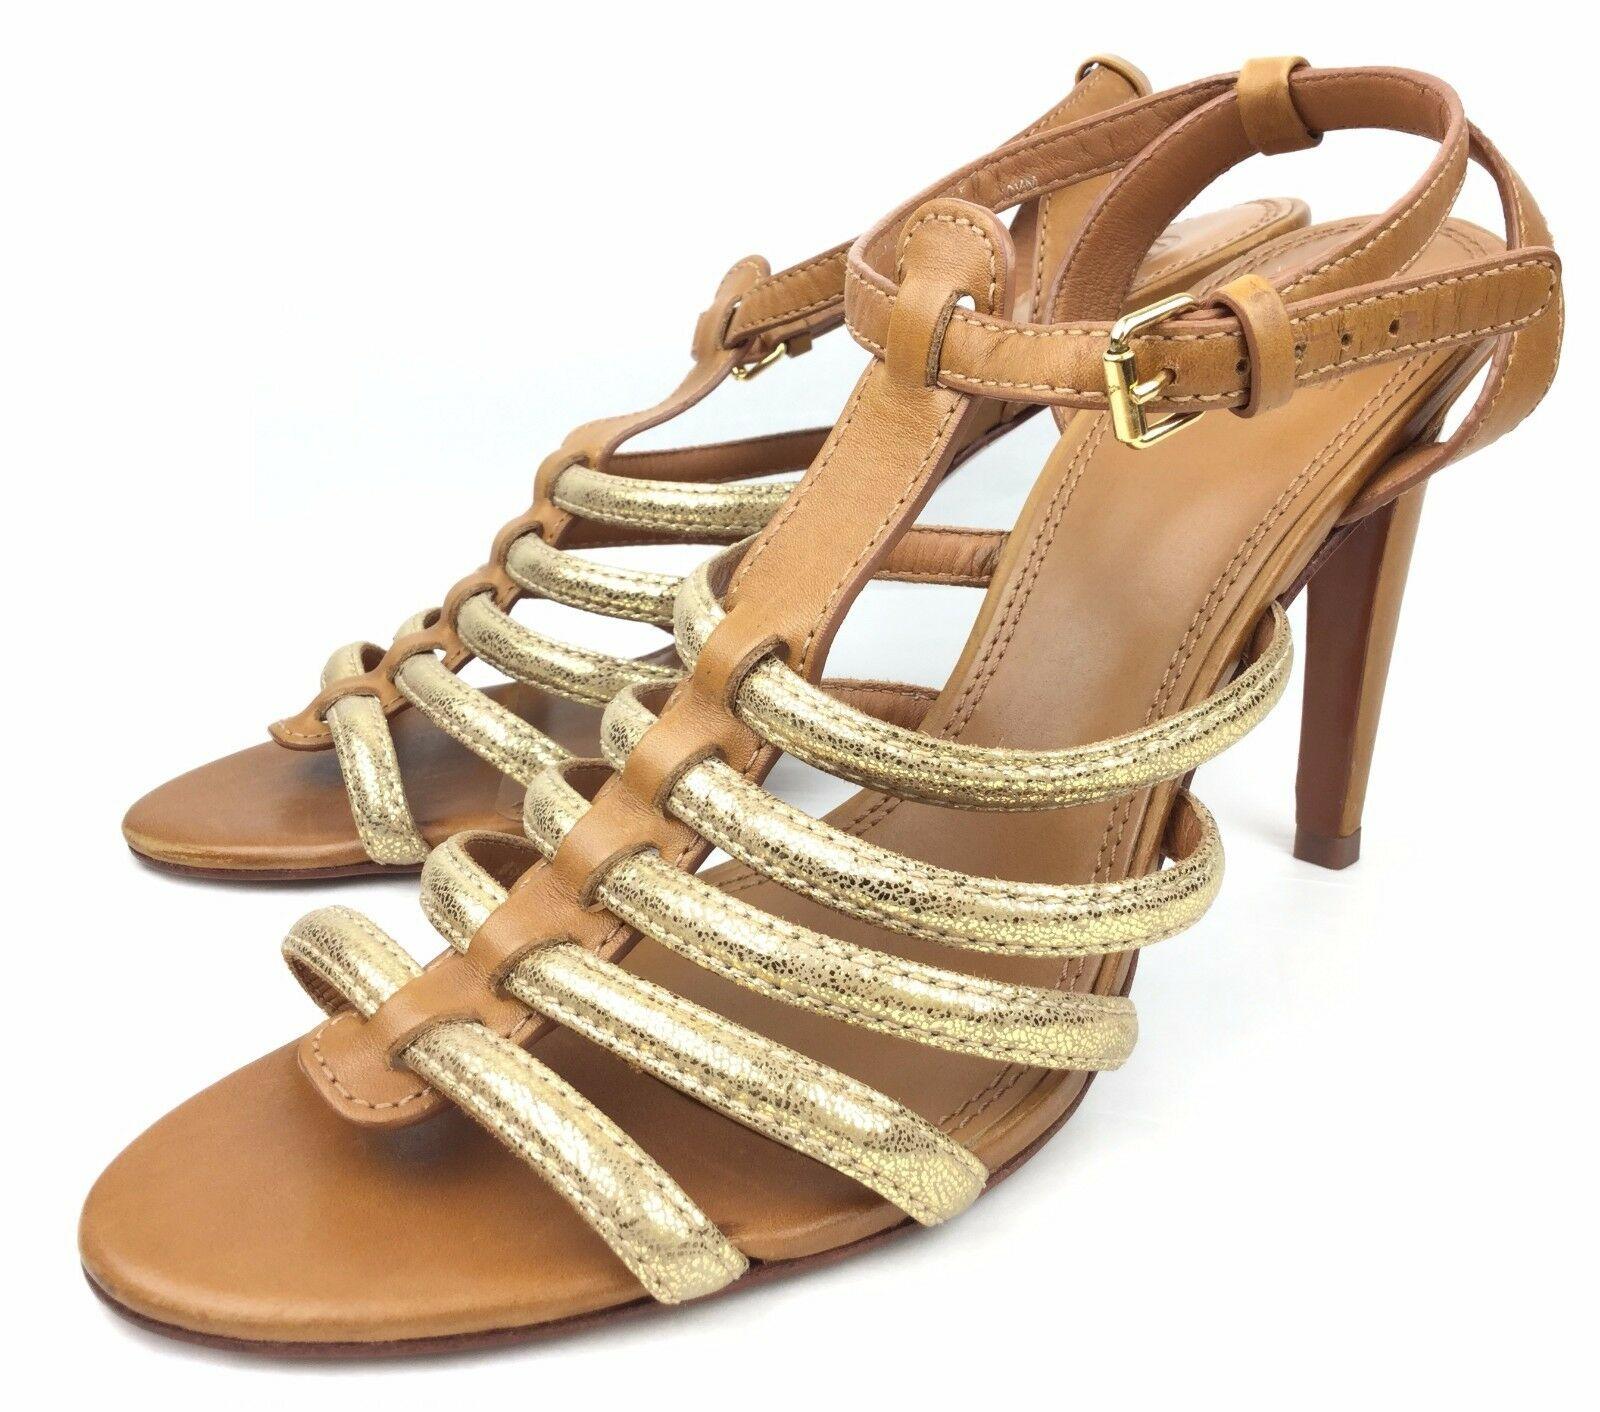 Tory Tory Tory Burch Charlene Tan gold Leather Gladiator Heels Sandals sz  US 10.5 7b0ba8